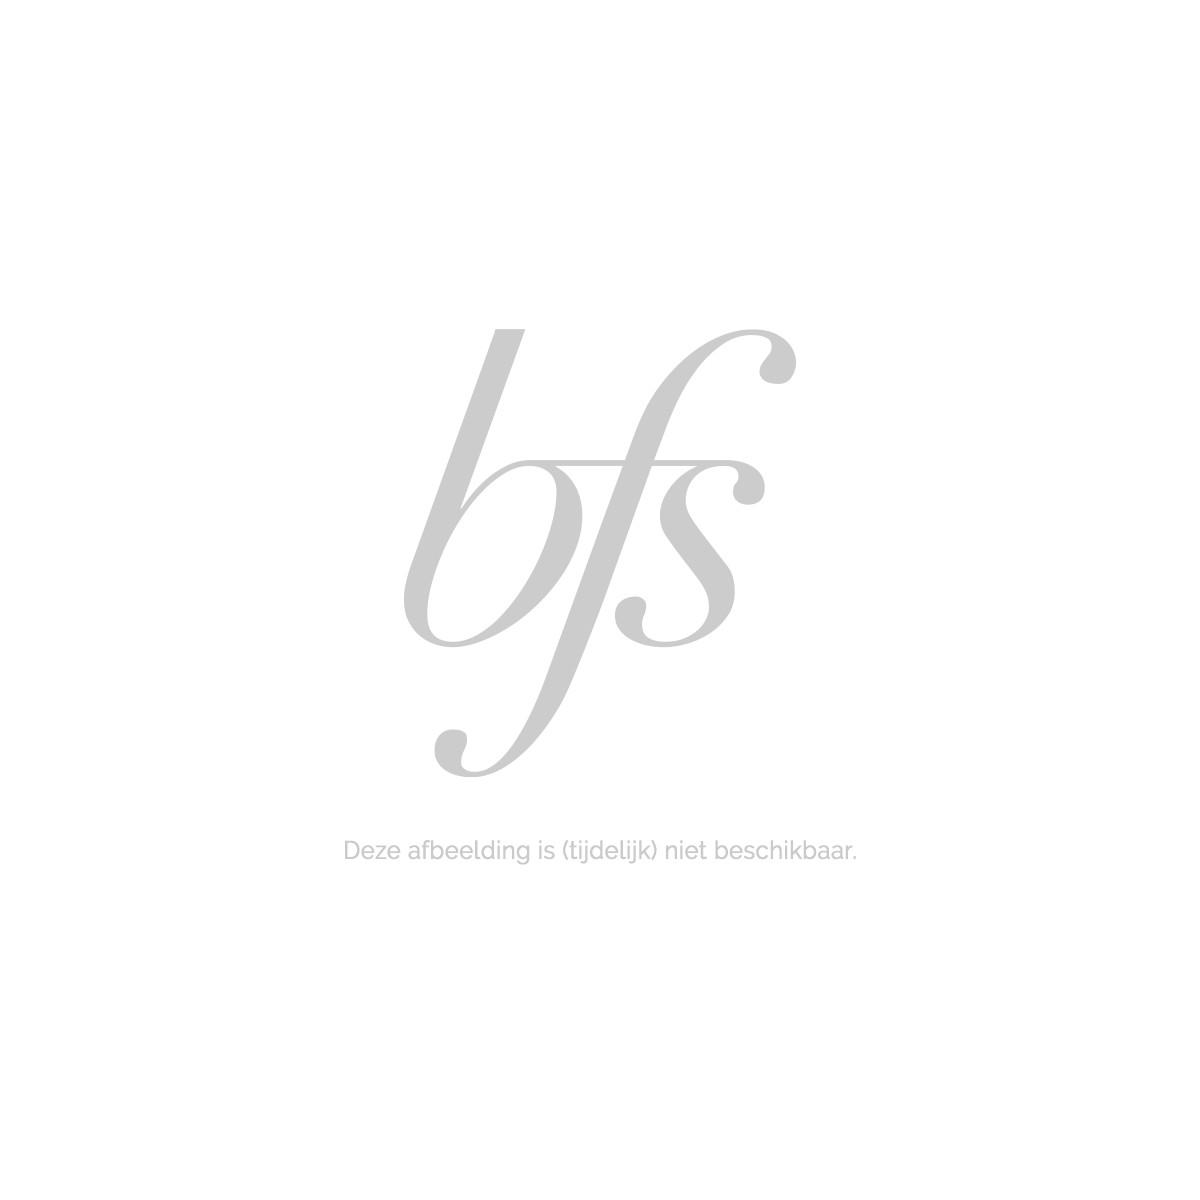 Beardburys Professionele Detail Trimmer Skid Zero